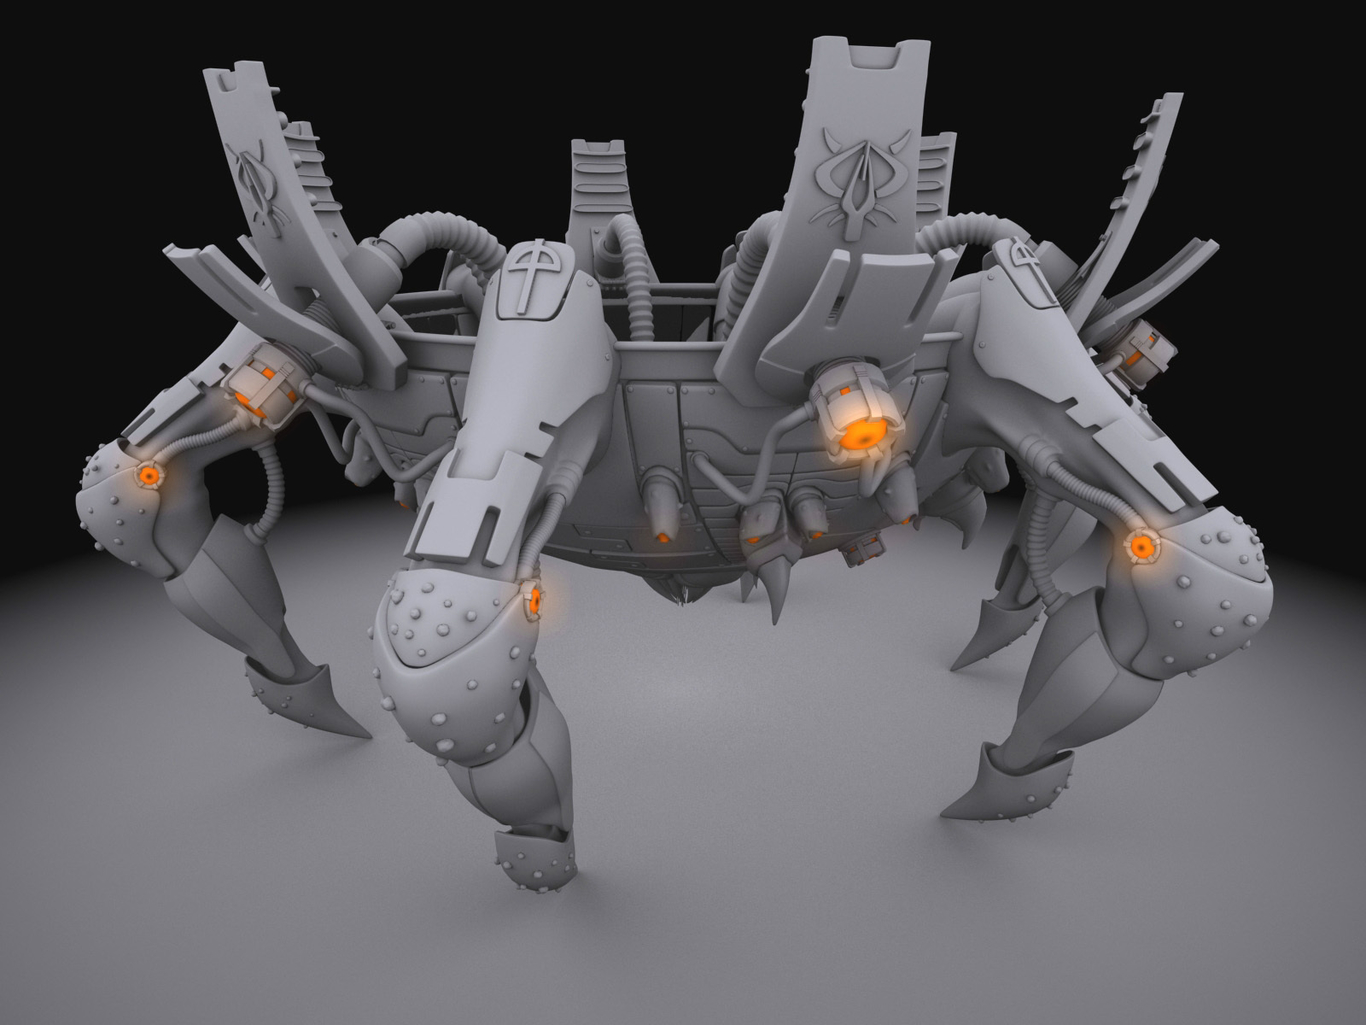 Bipolar stormrise spiderbot 1 d2a8a7db 84zn